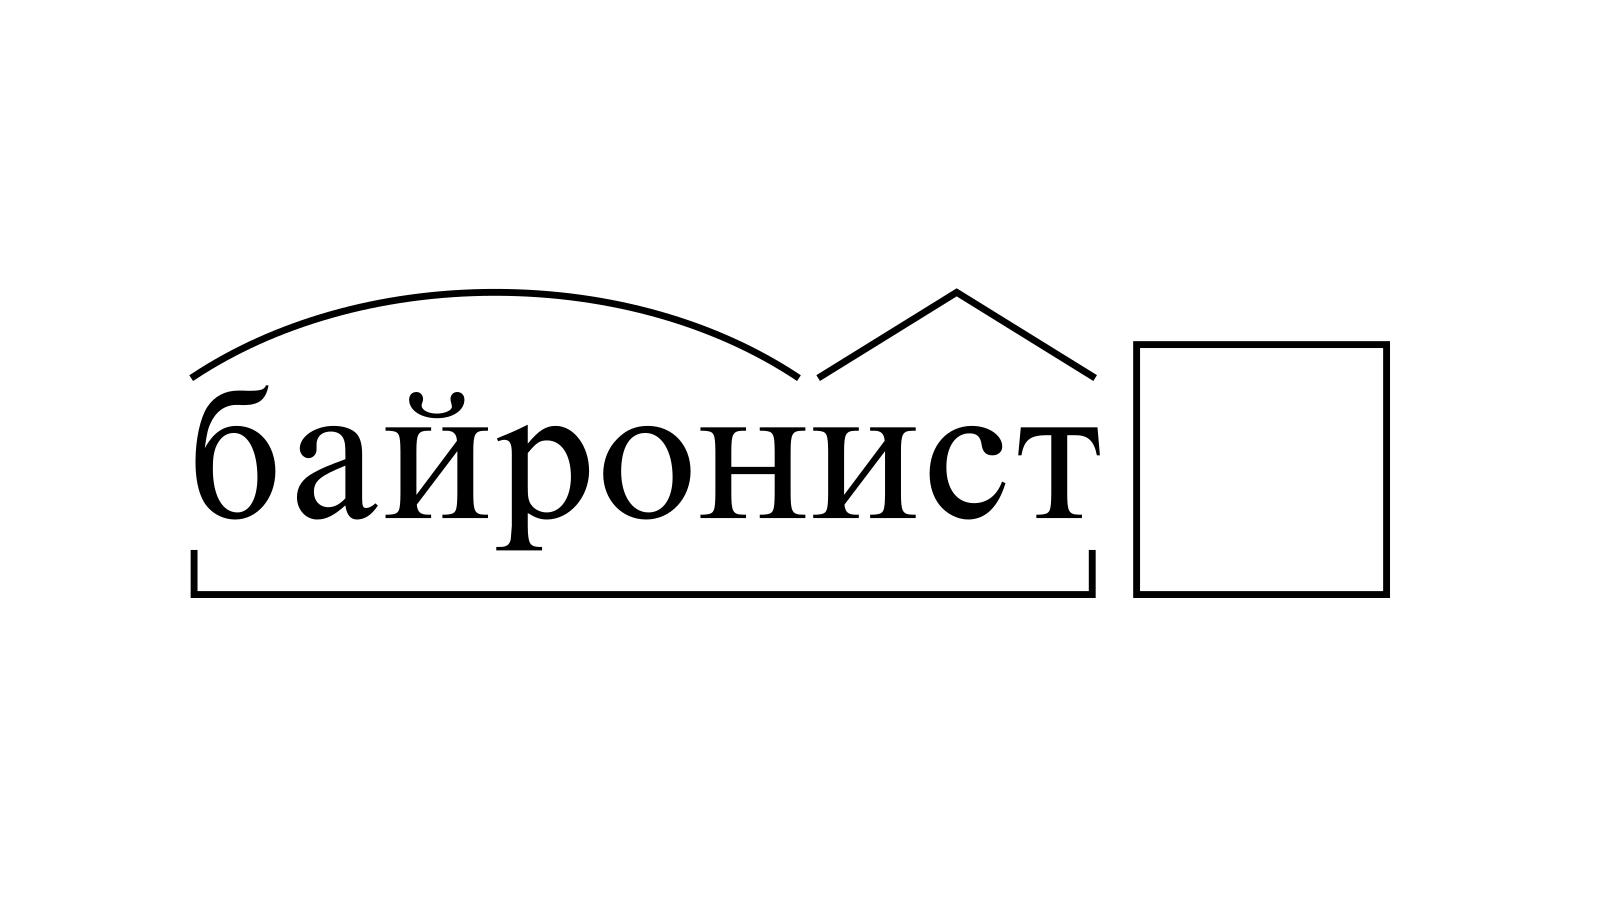 Разбор слова «байронист» по составу